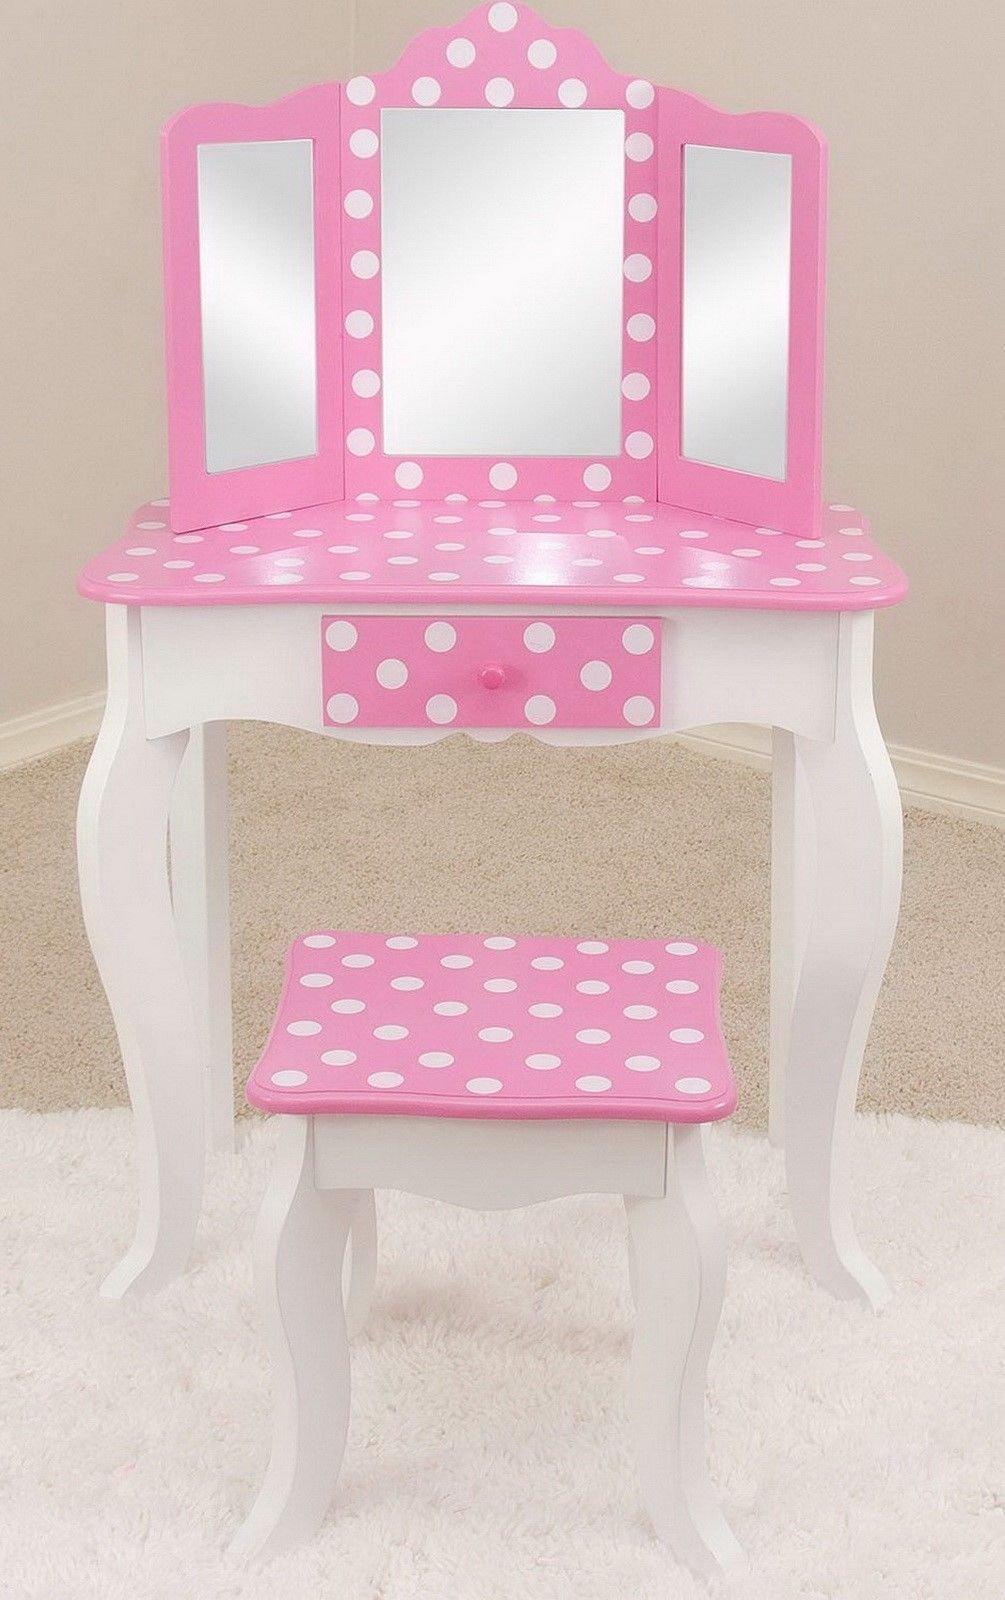 Teamson Kids Fashion Prints Polka Dot Vanity Table & Stool (Pink / White)